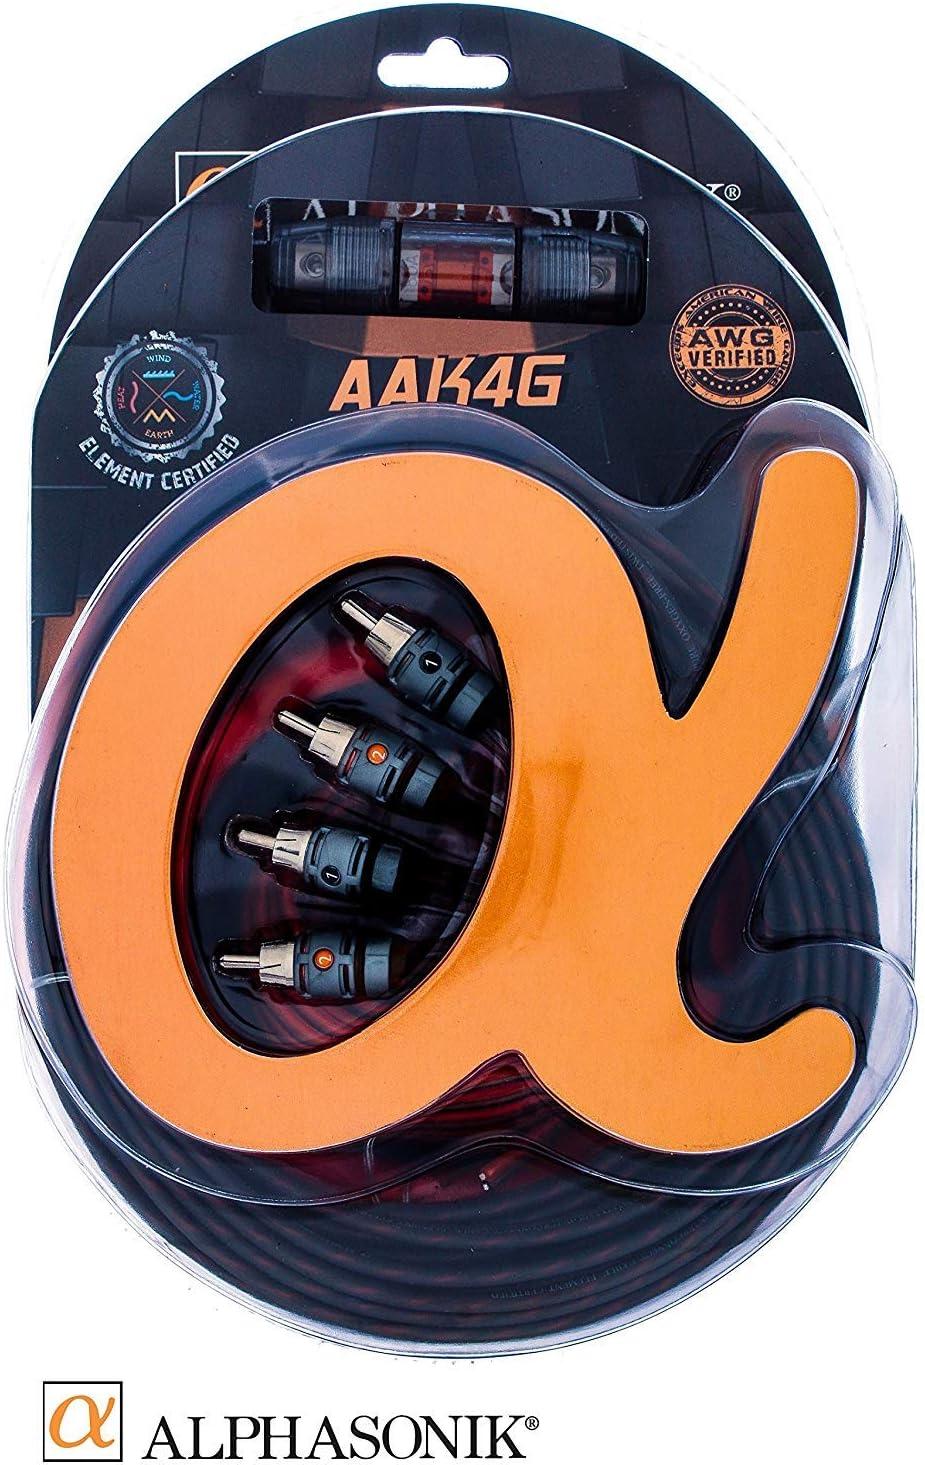 Standard Element Certified Amp Install Kit Exceeds AWG Alphasonik AAK4G Premium 4-Gauge Complete Car Amplifier Installation Kit Hyper-Flex Power American Wire Gauge Ground Speaker Wire RCA Cable